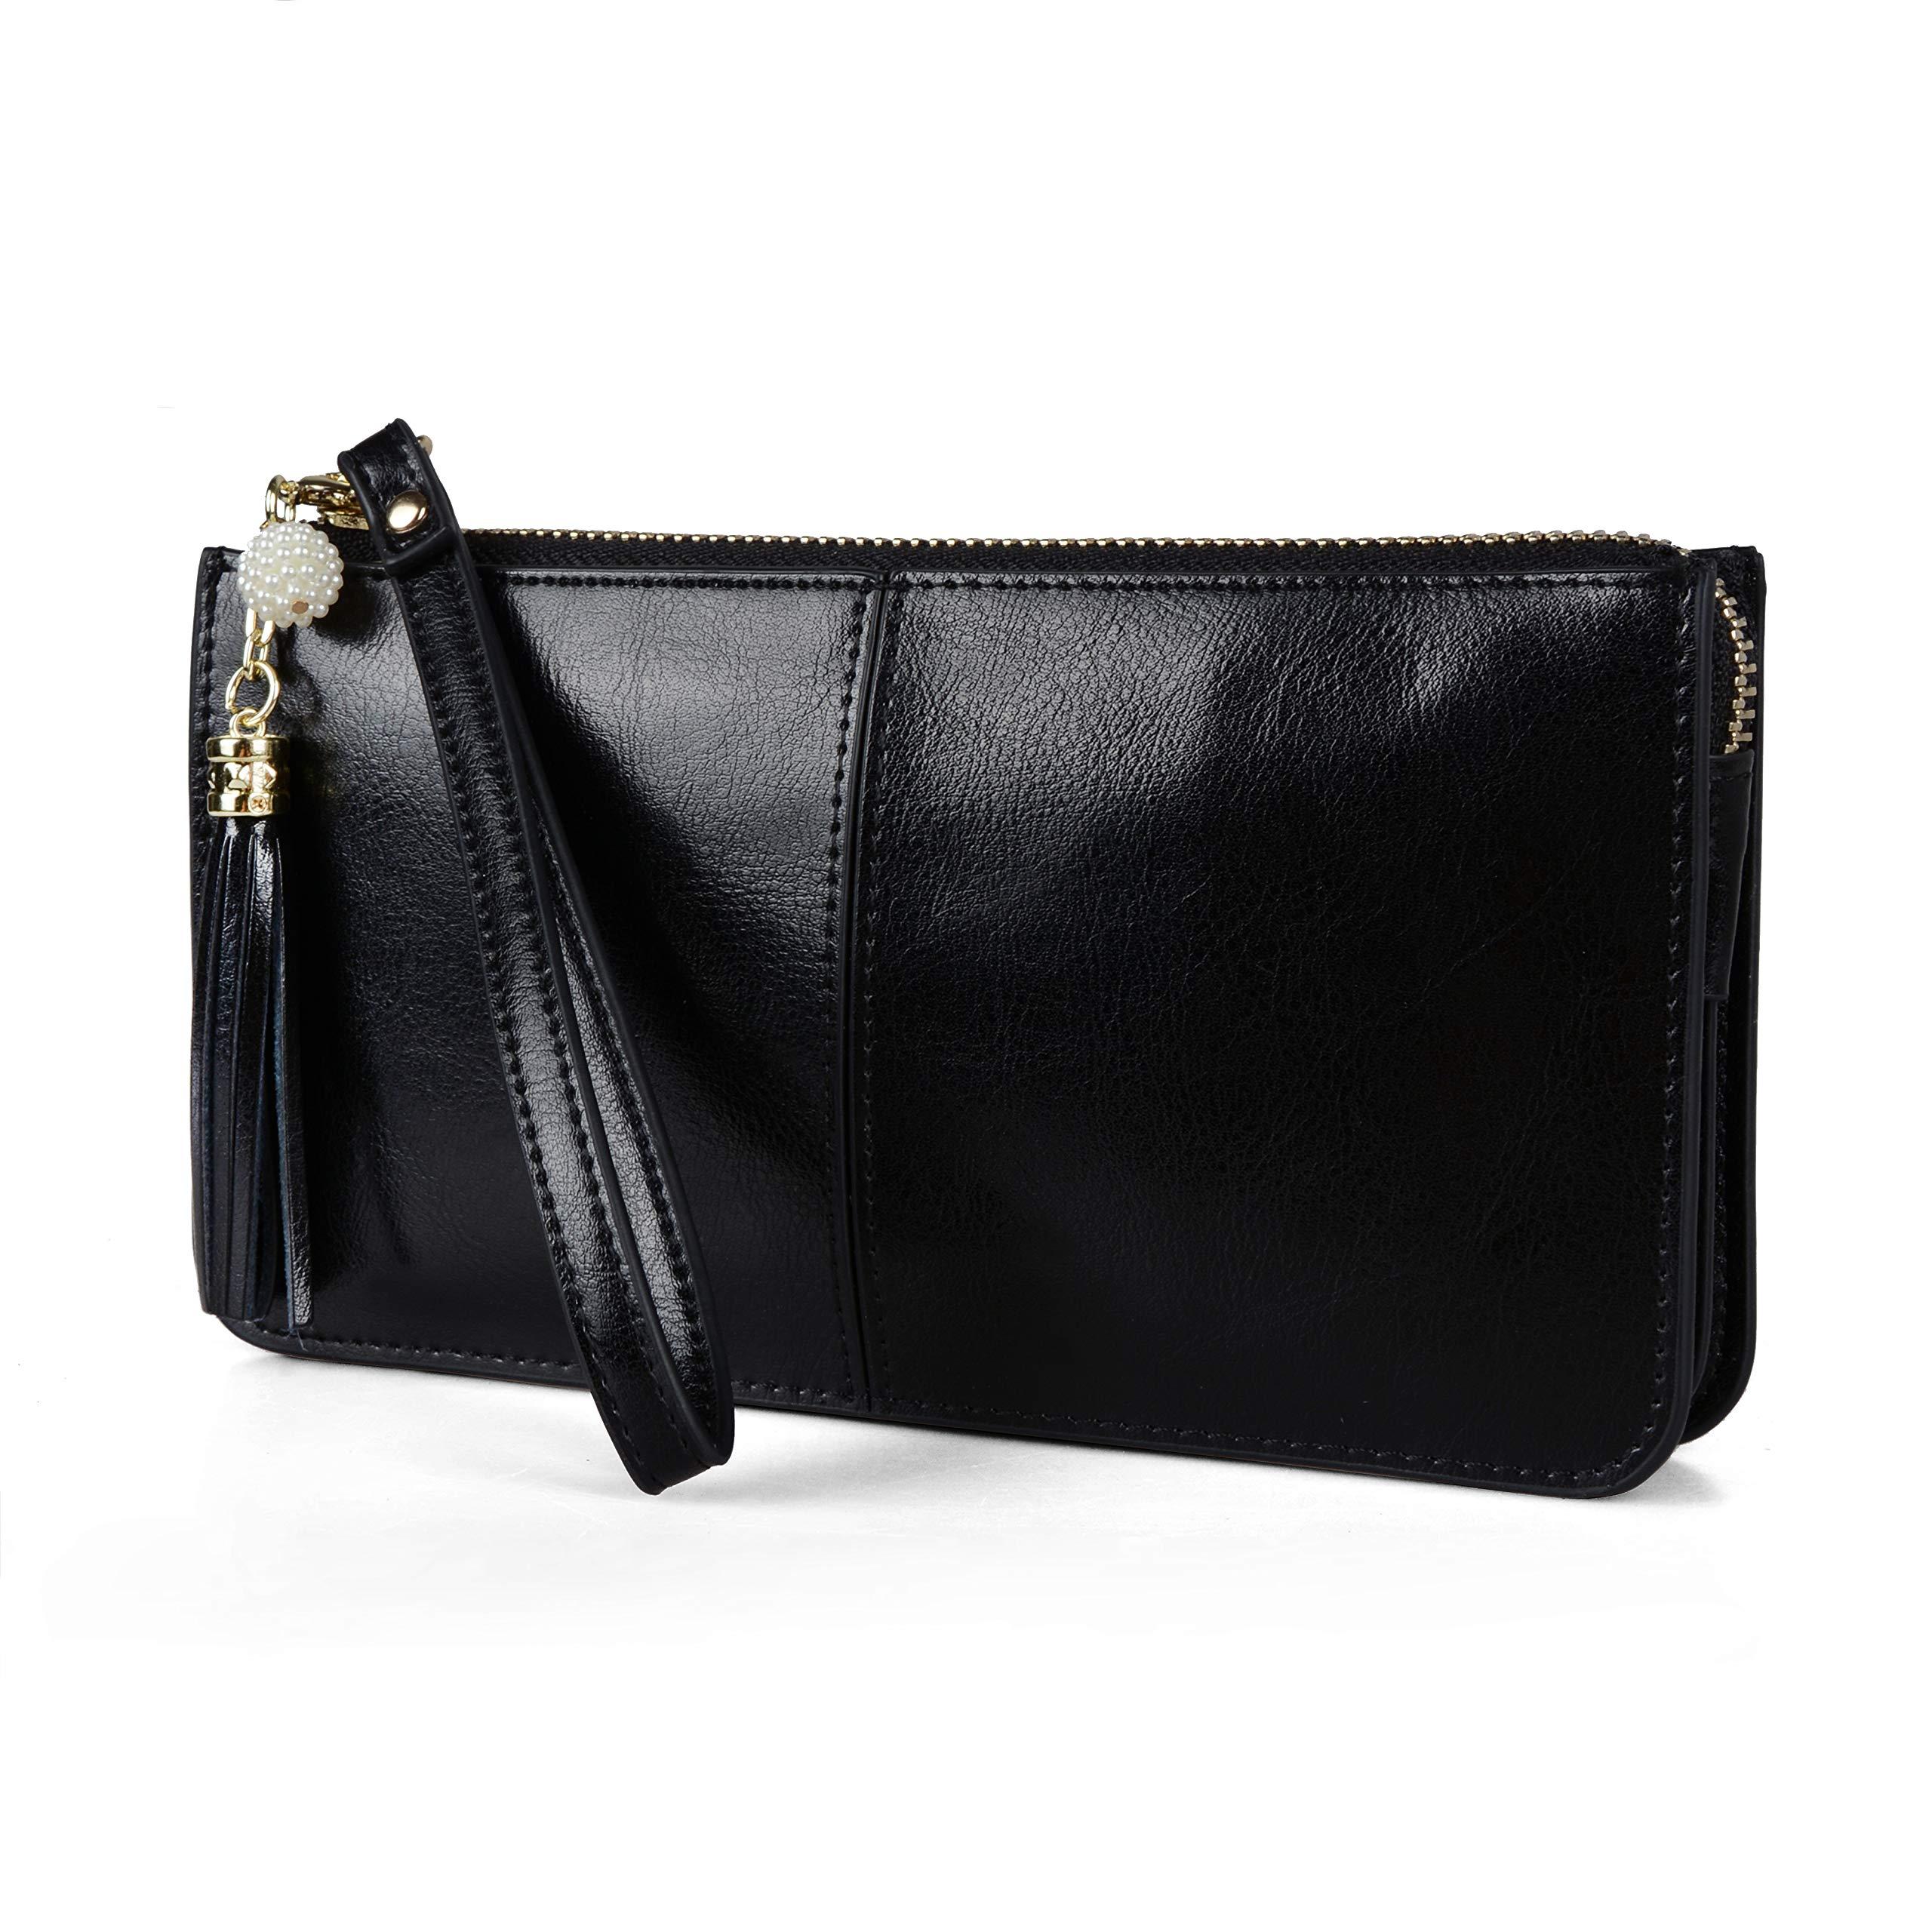 Befen Women's Genuine Leather Wristlet Clutch Cell Phone Wallet Multi Card Organizer Wallet Purse